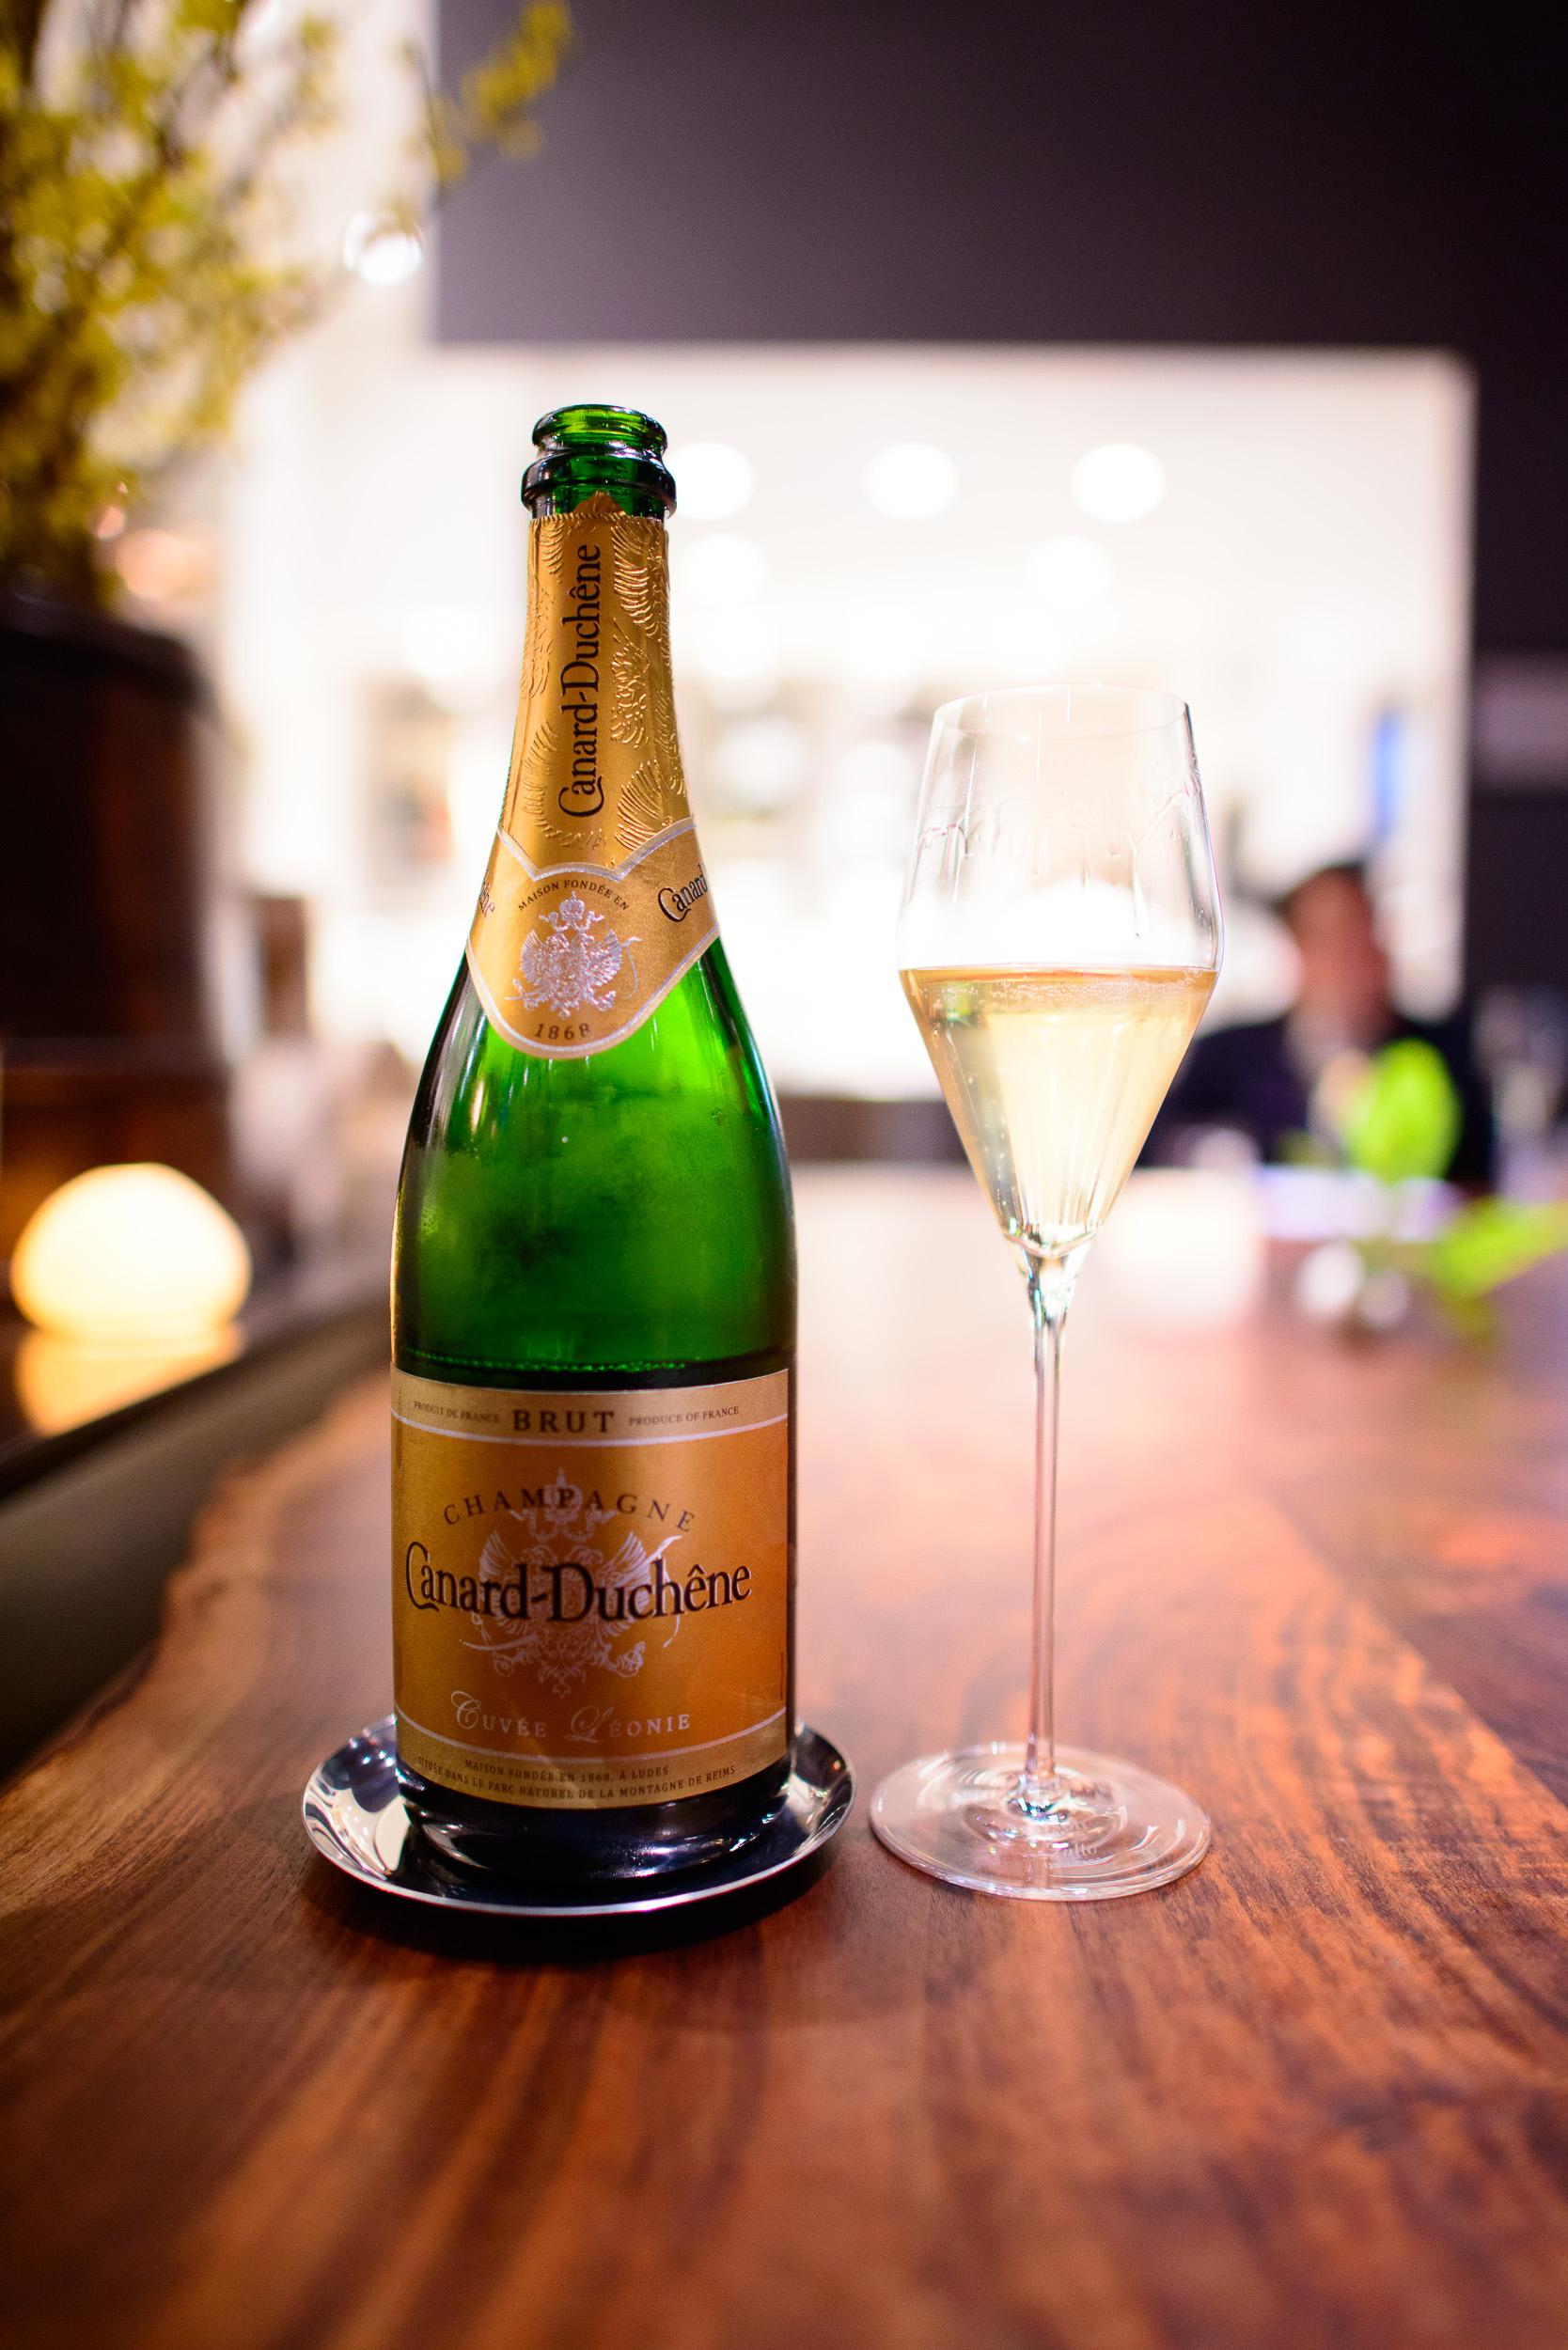 Champagne Canard-Duchêne, Cuvée Léonie